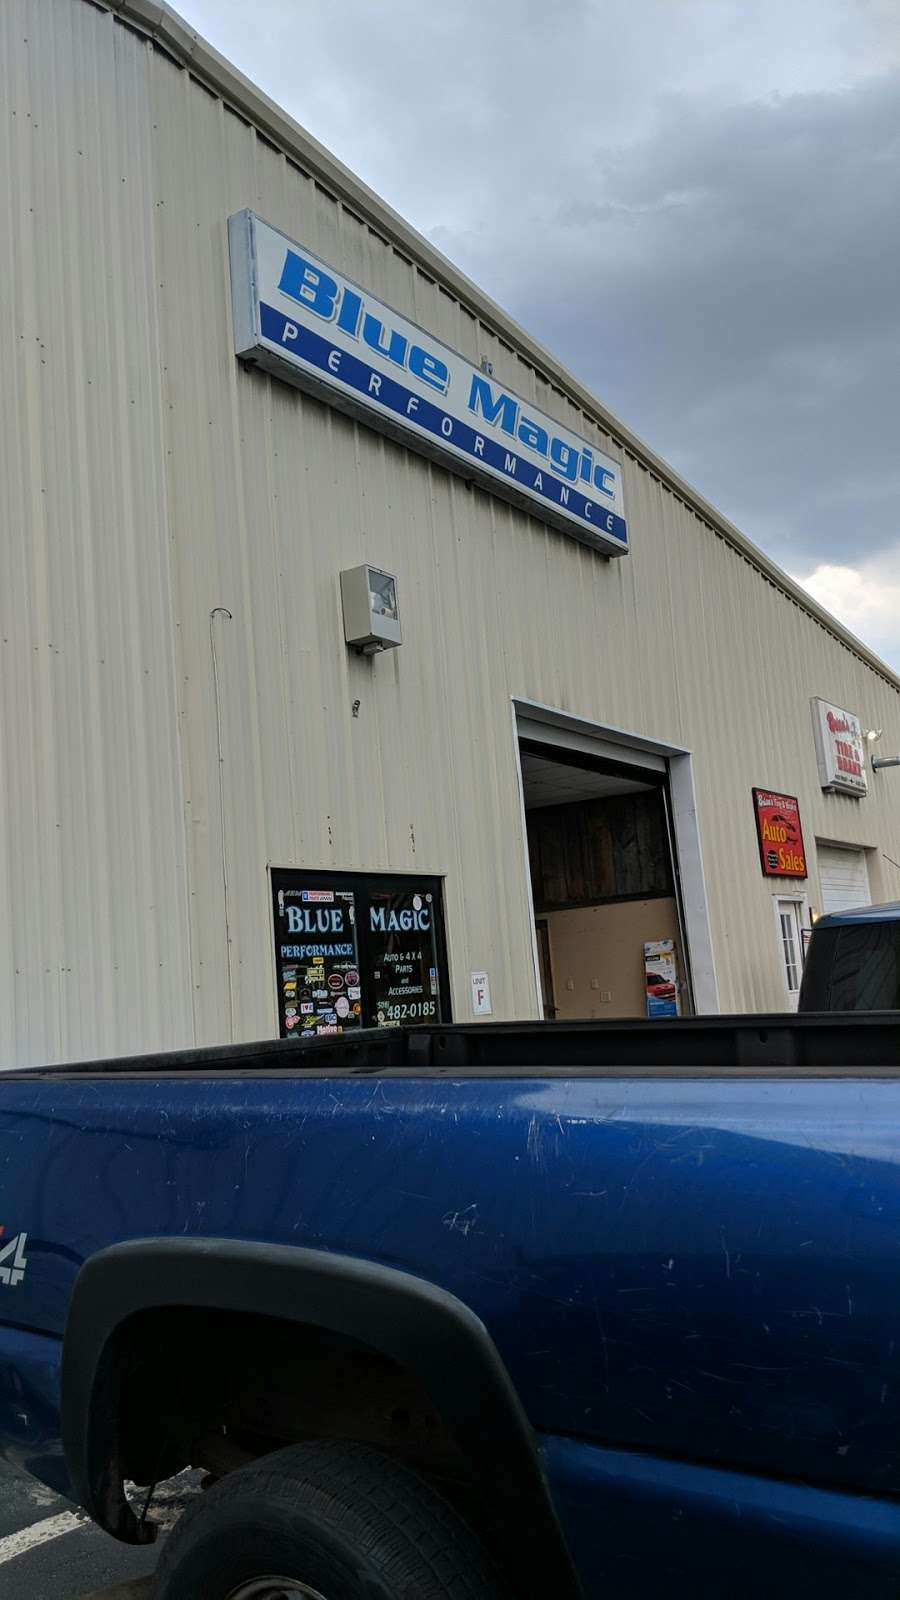 Blue Magic Performance Plus - car repair  | Photo 1 of 5 | Address: 28 Hastings St, Mendon, MA 01756, USA | Phone: (508) 482-0185